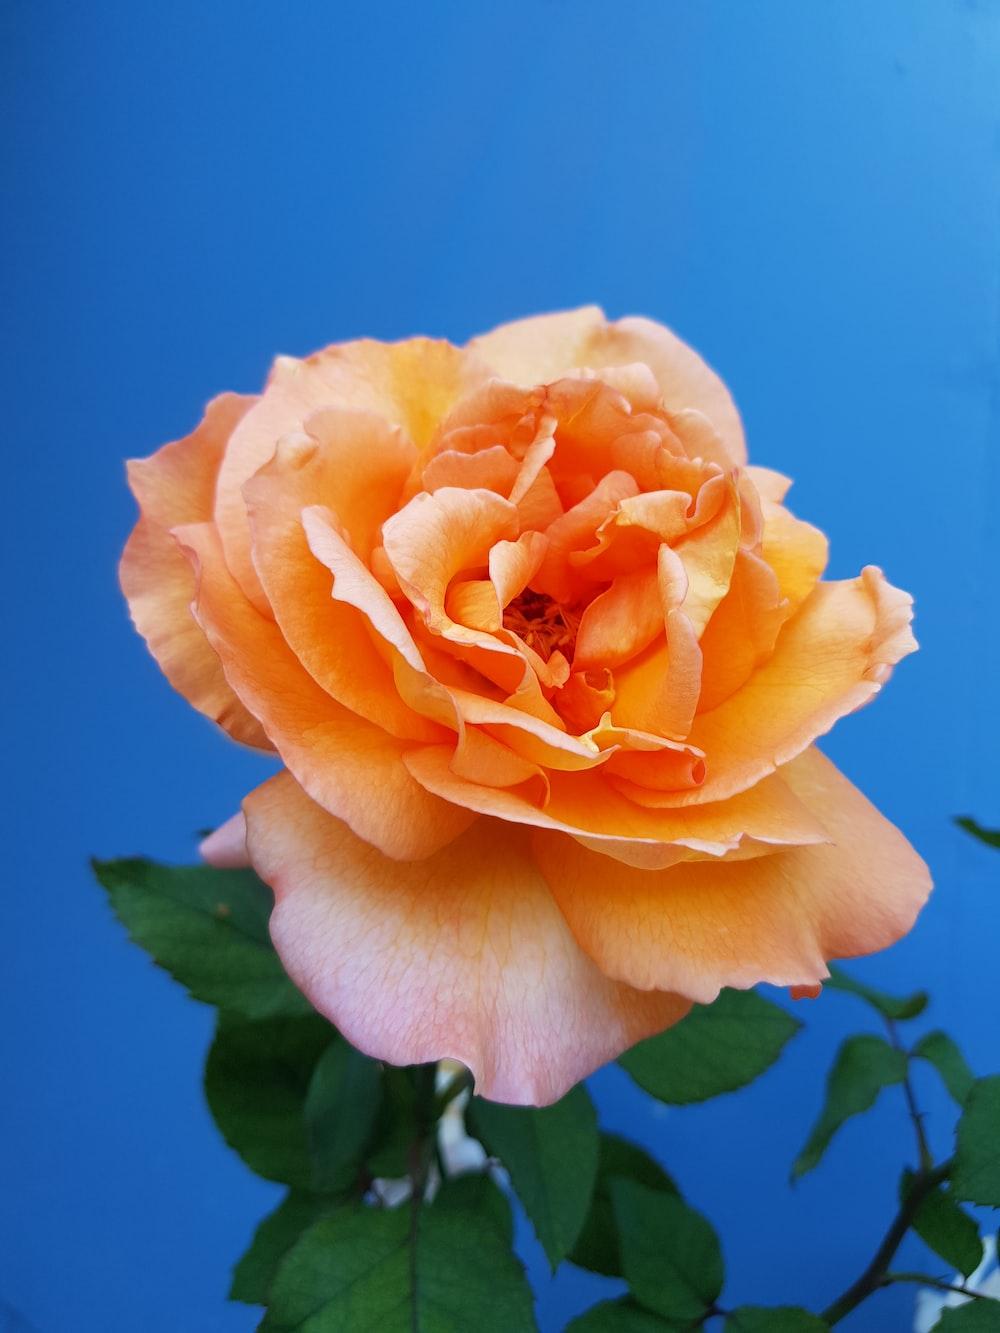 closeup of orange petaled flower